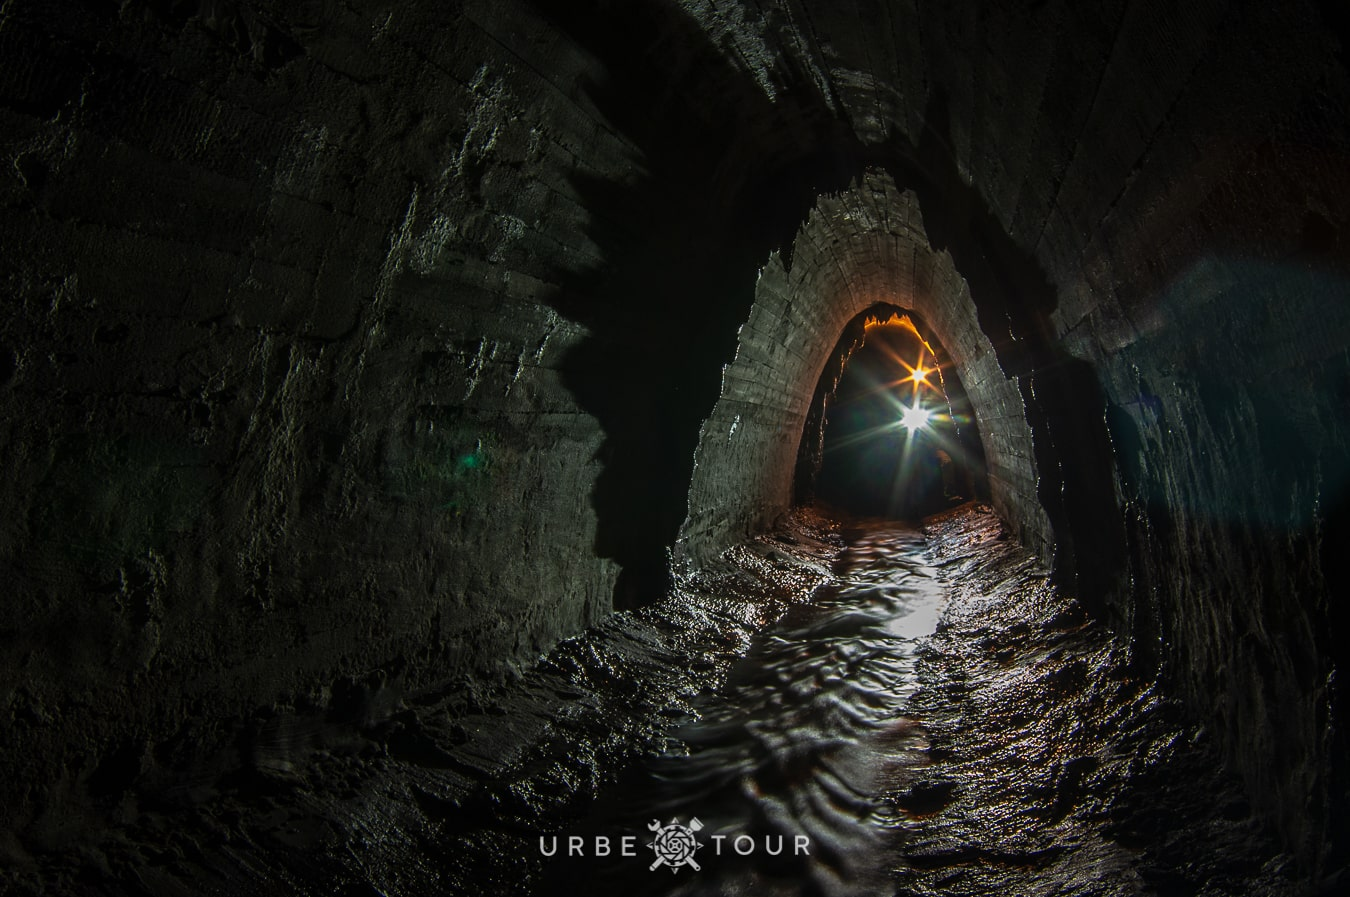 kyiv-urbex-tour NEVODNICHI UNDERGROUND RIVER IN KYIV